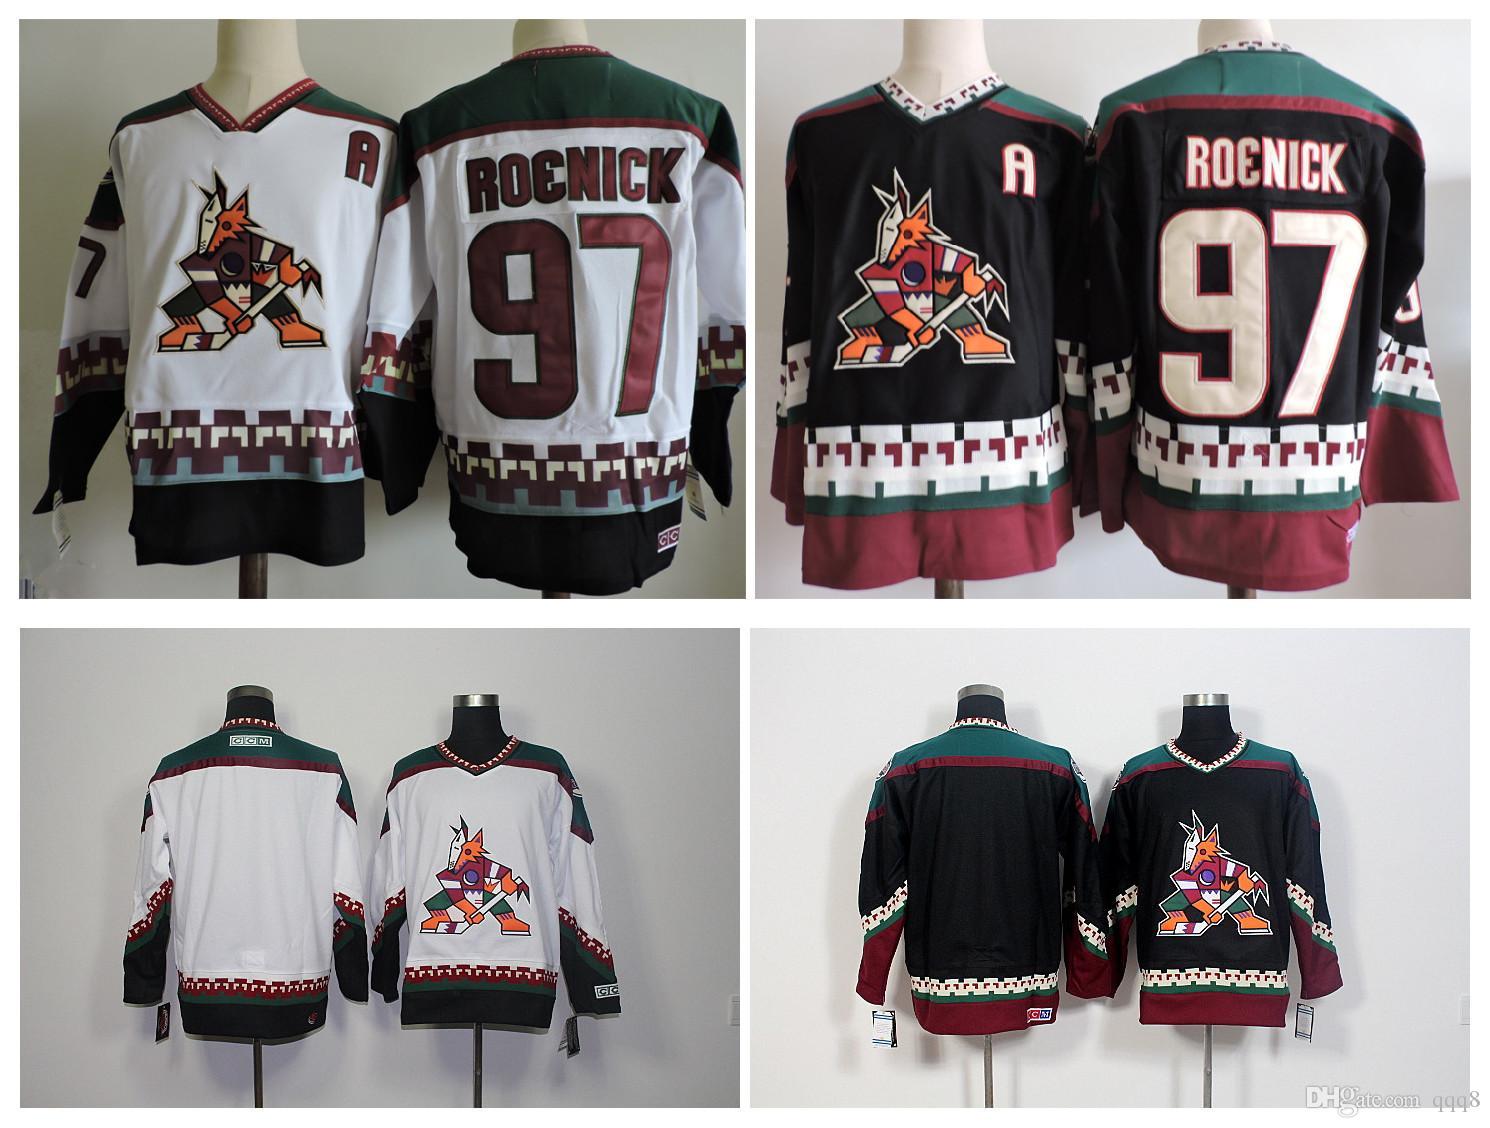 2016 Men Phoenix Coyotes 97 Jeremy Roenick Hockey Jerseys Cheap Arizona  Blank Authentic Retro Vintage CCM Stitched Jerseys From Qqq8 1f08971cd